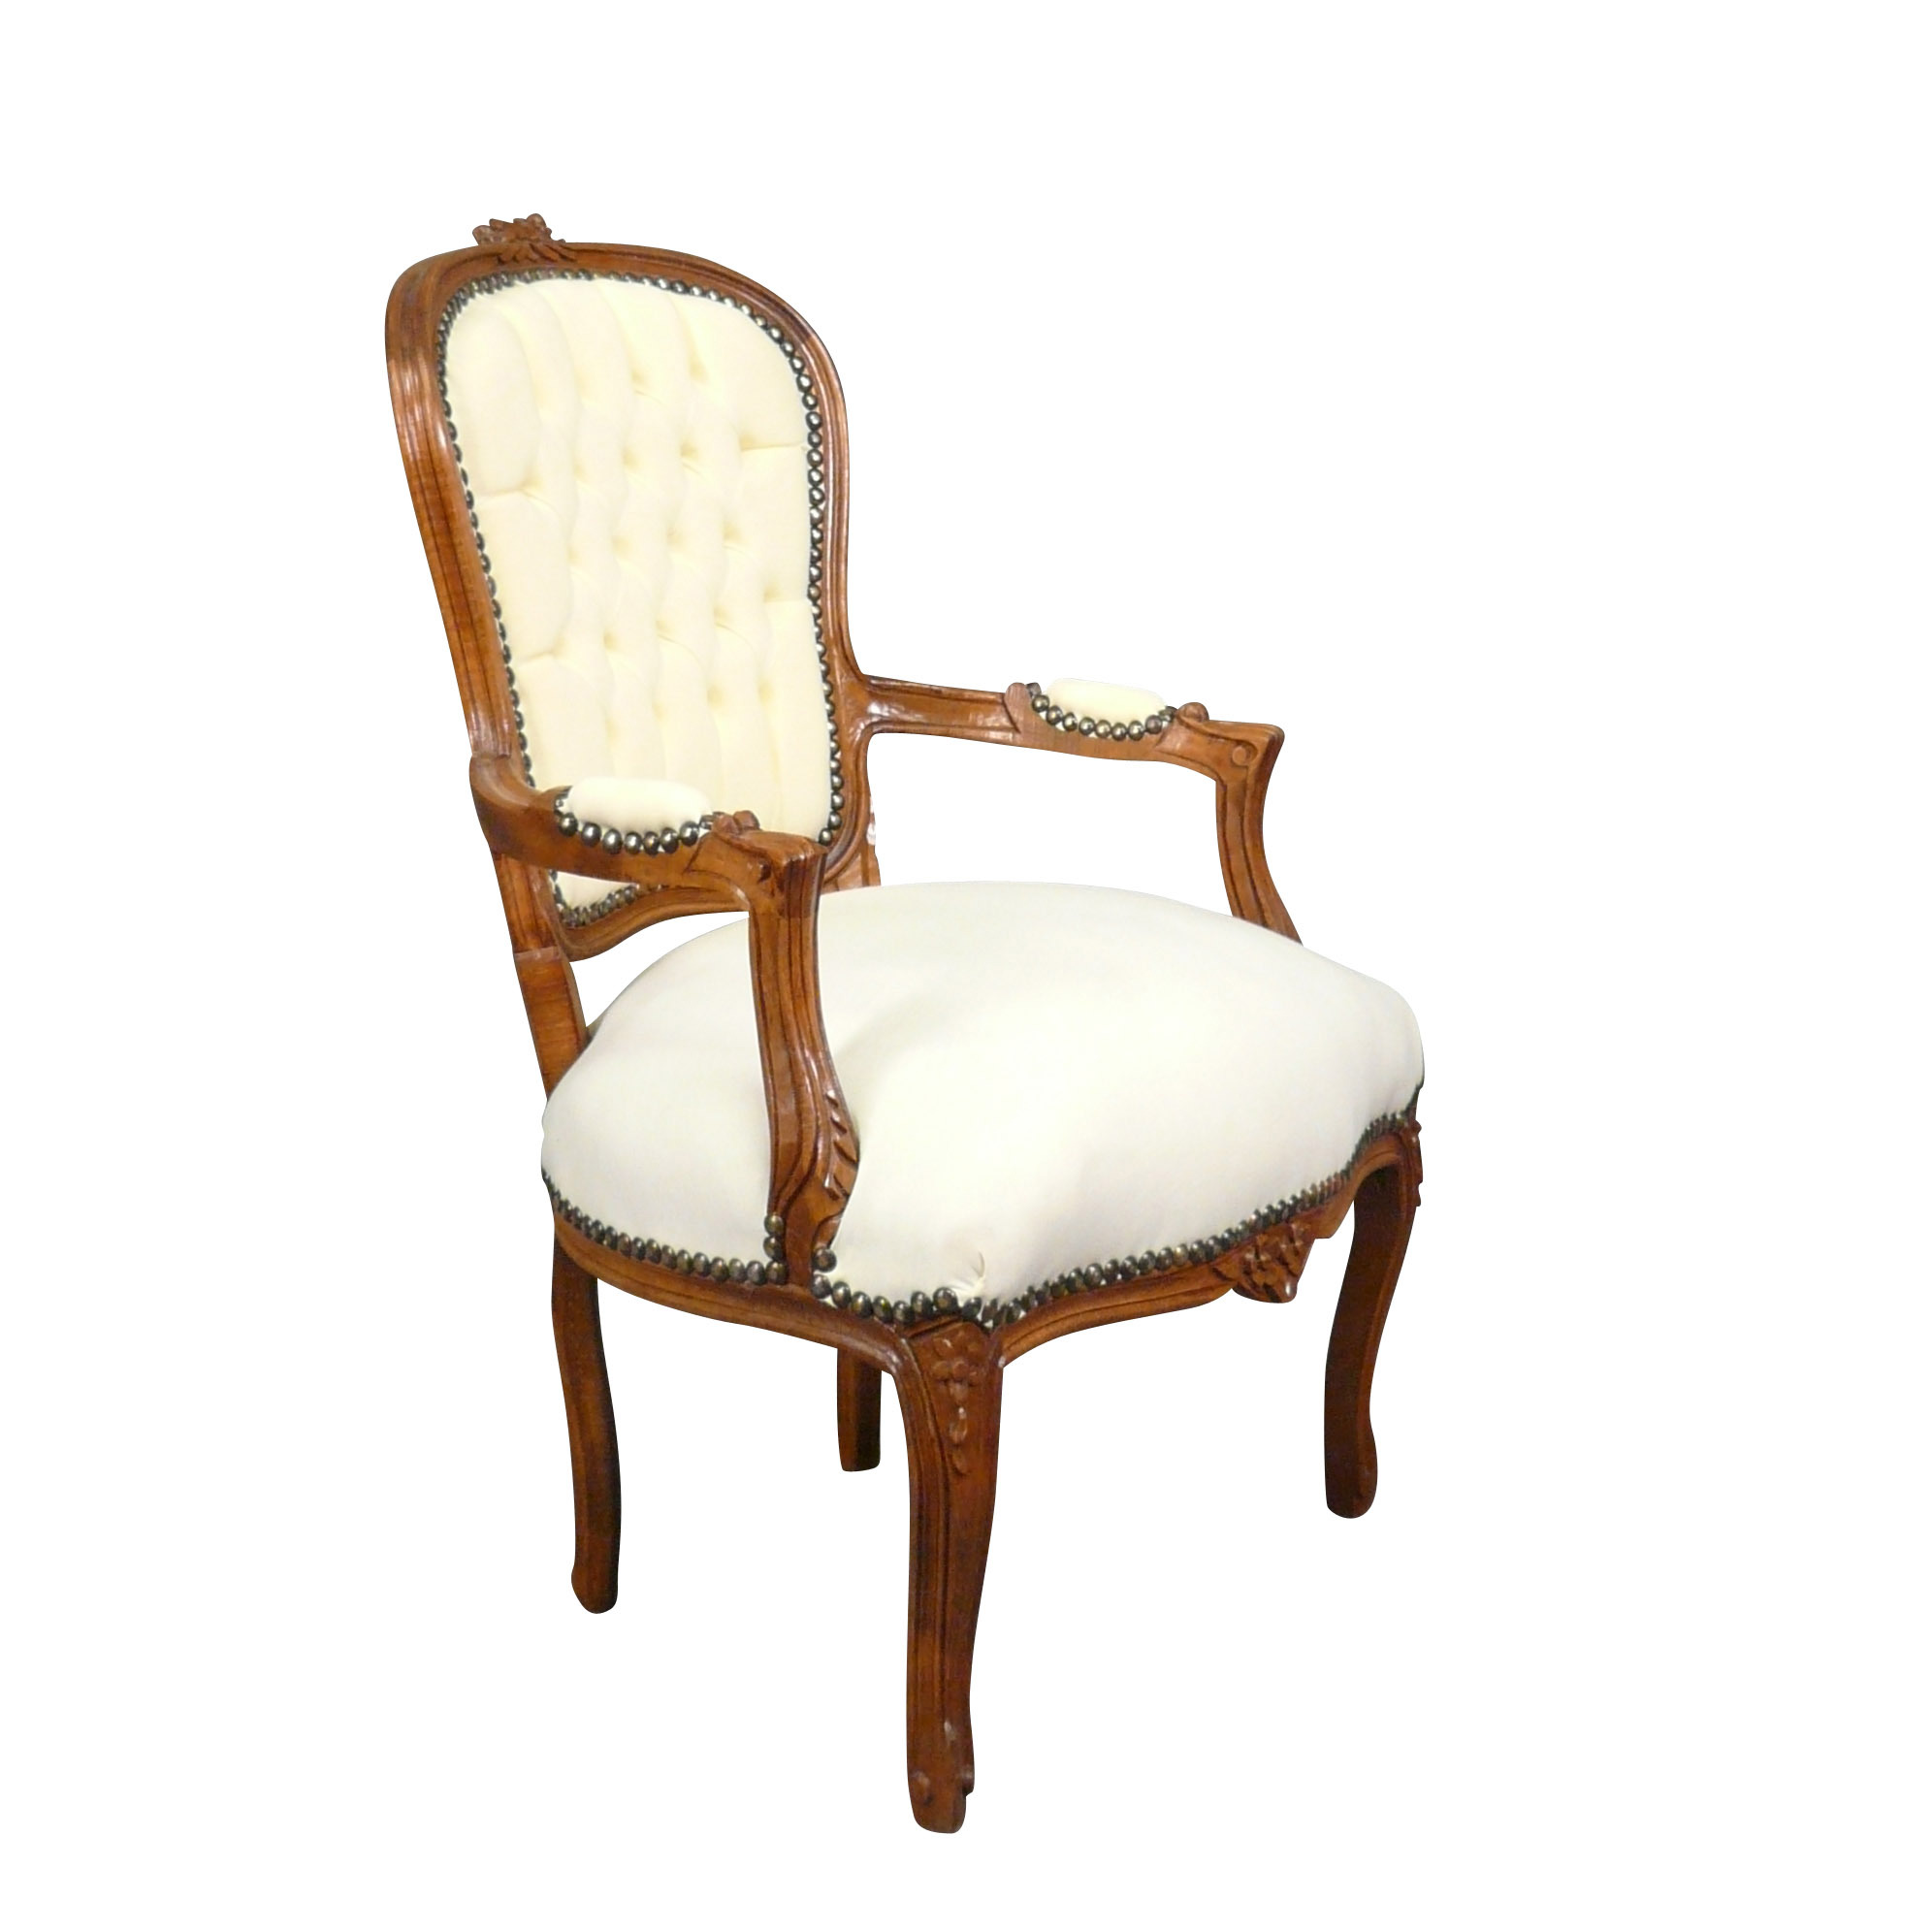 Louis Xv Armchair Photo Gallery Louis Xv Furniture